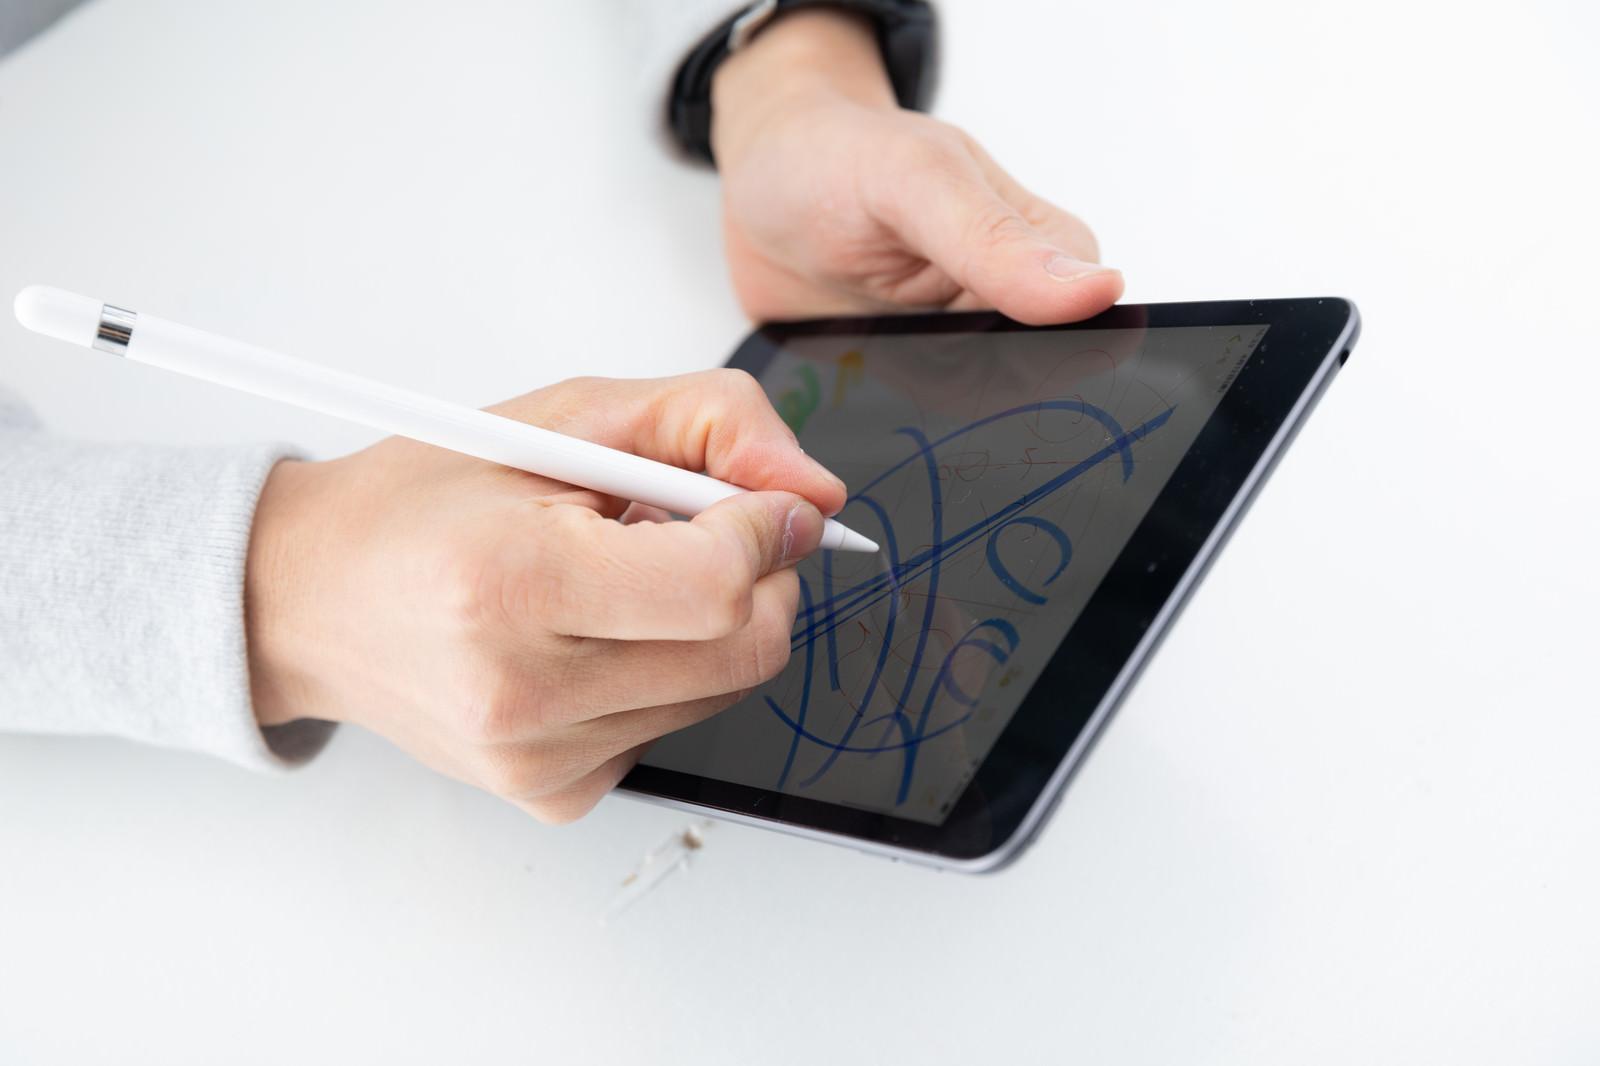 「Applepencilの書き心地を確かめる男性」の写真